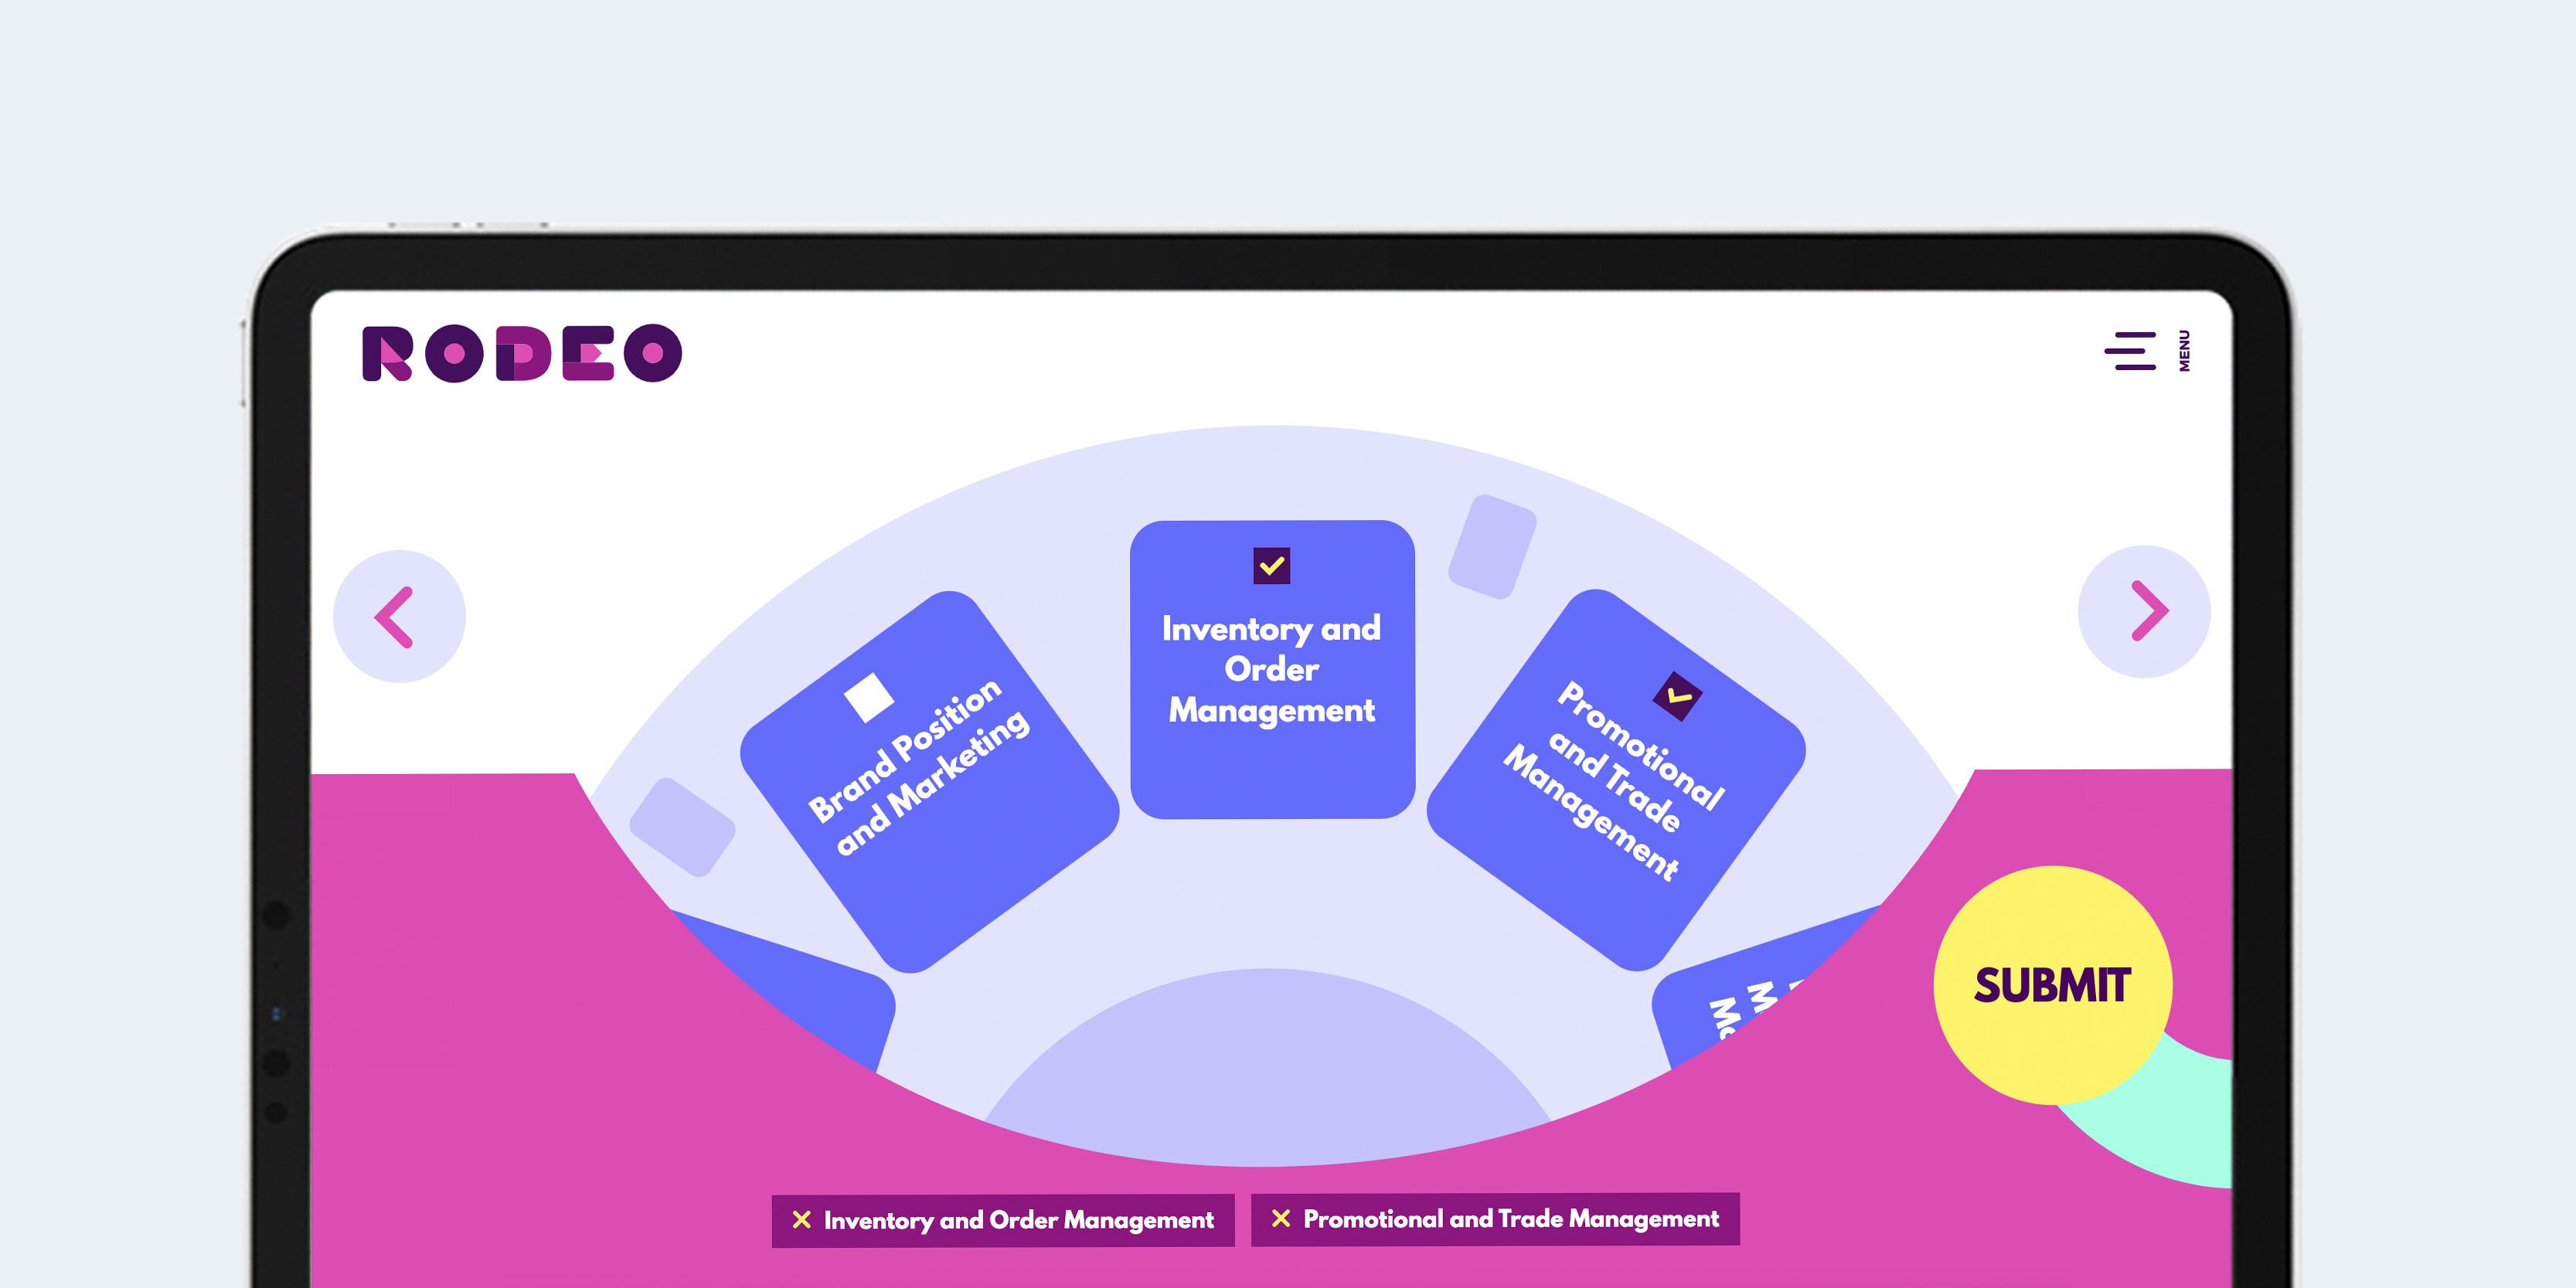 Rodeo CPG website design